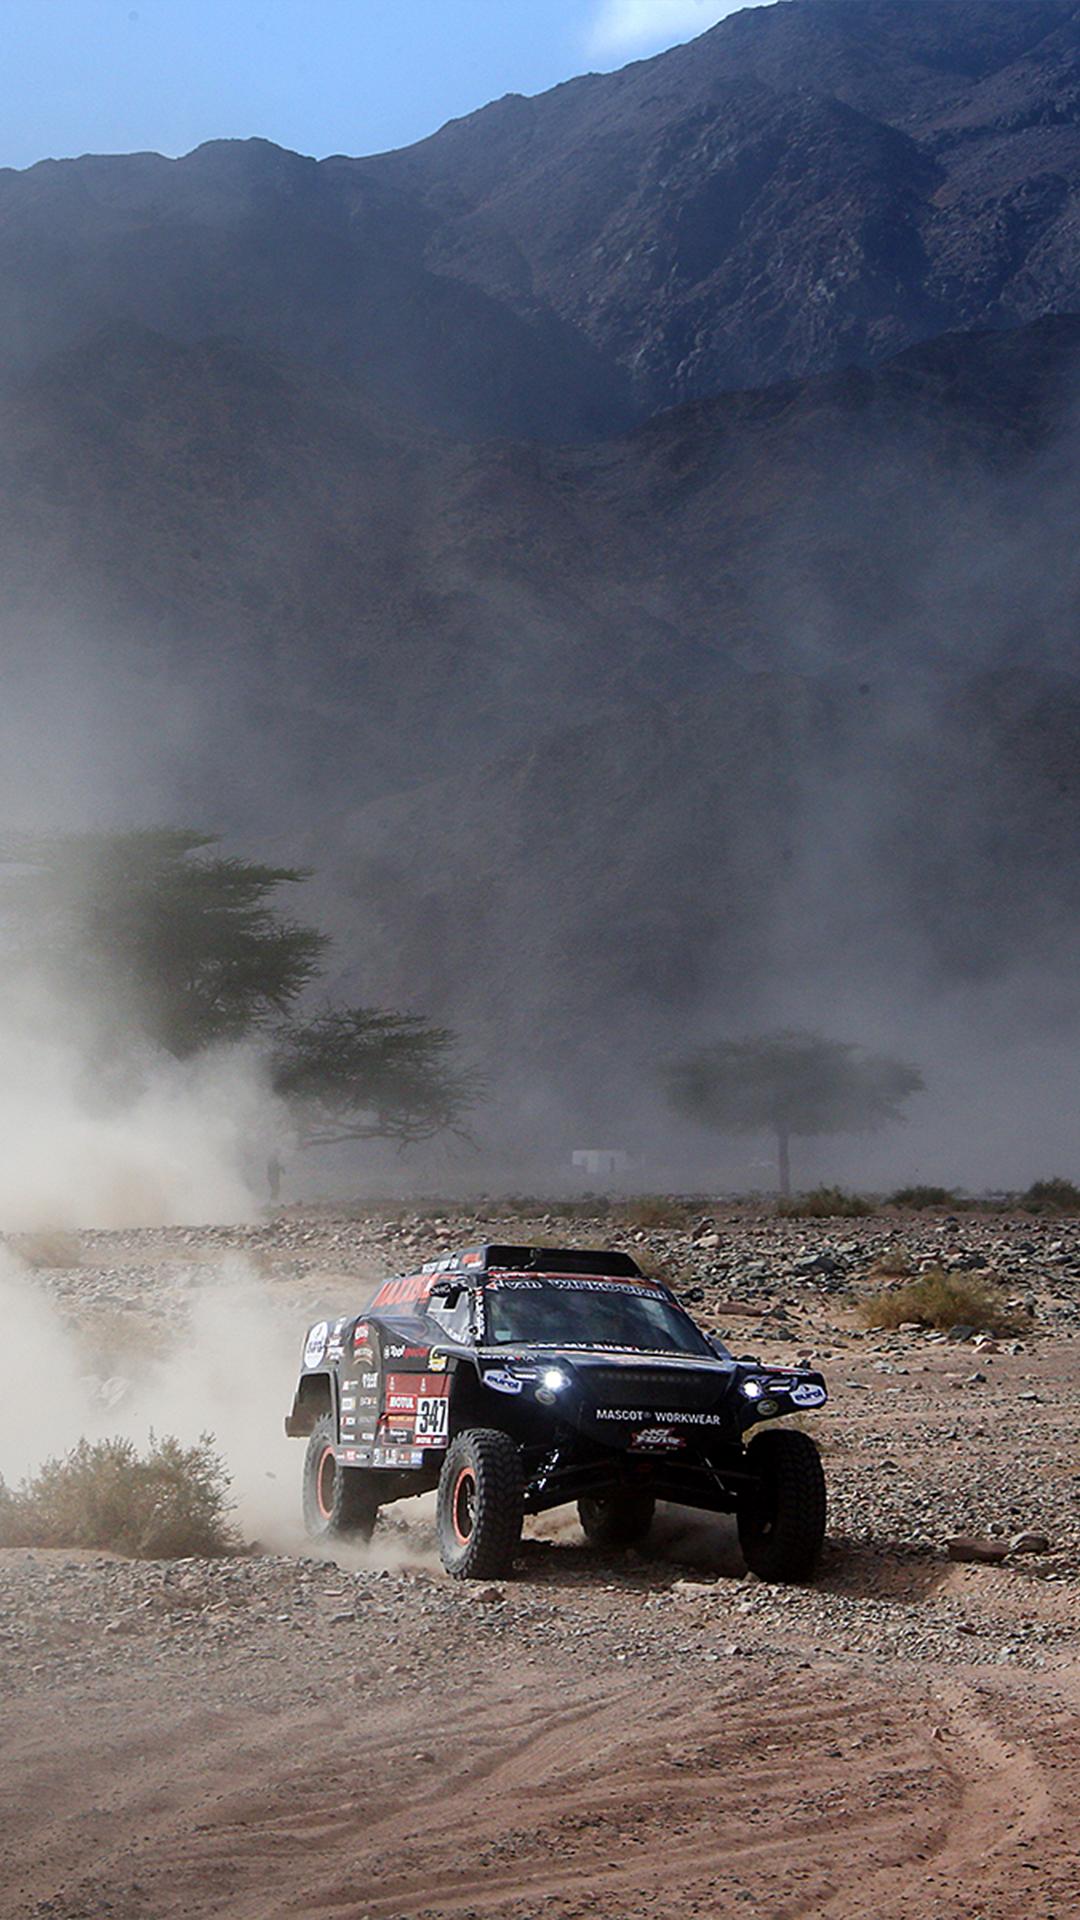 Dakar Rally 2020 Rally Wallpapers Dakar Trophy Truck Baja